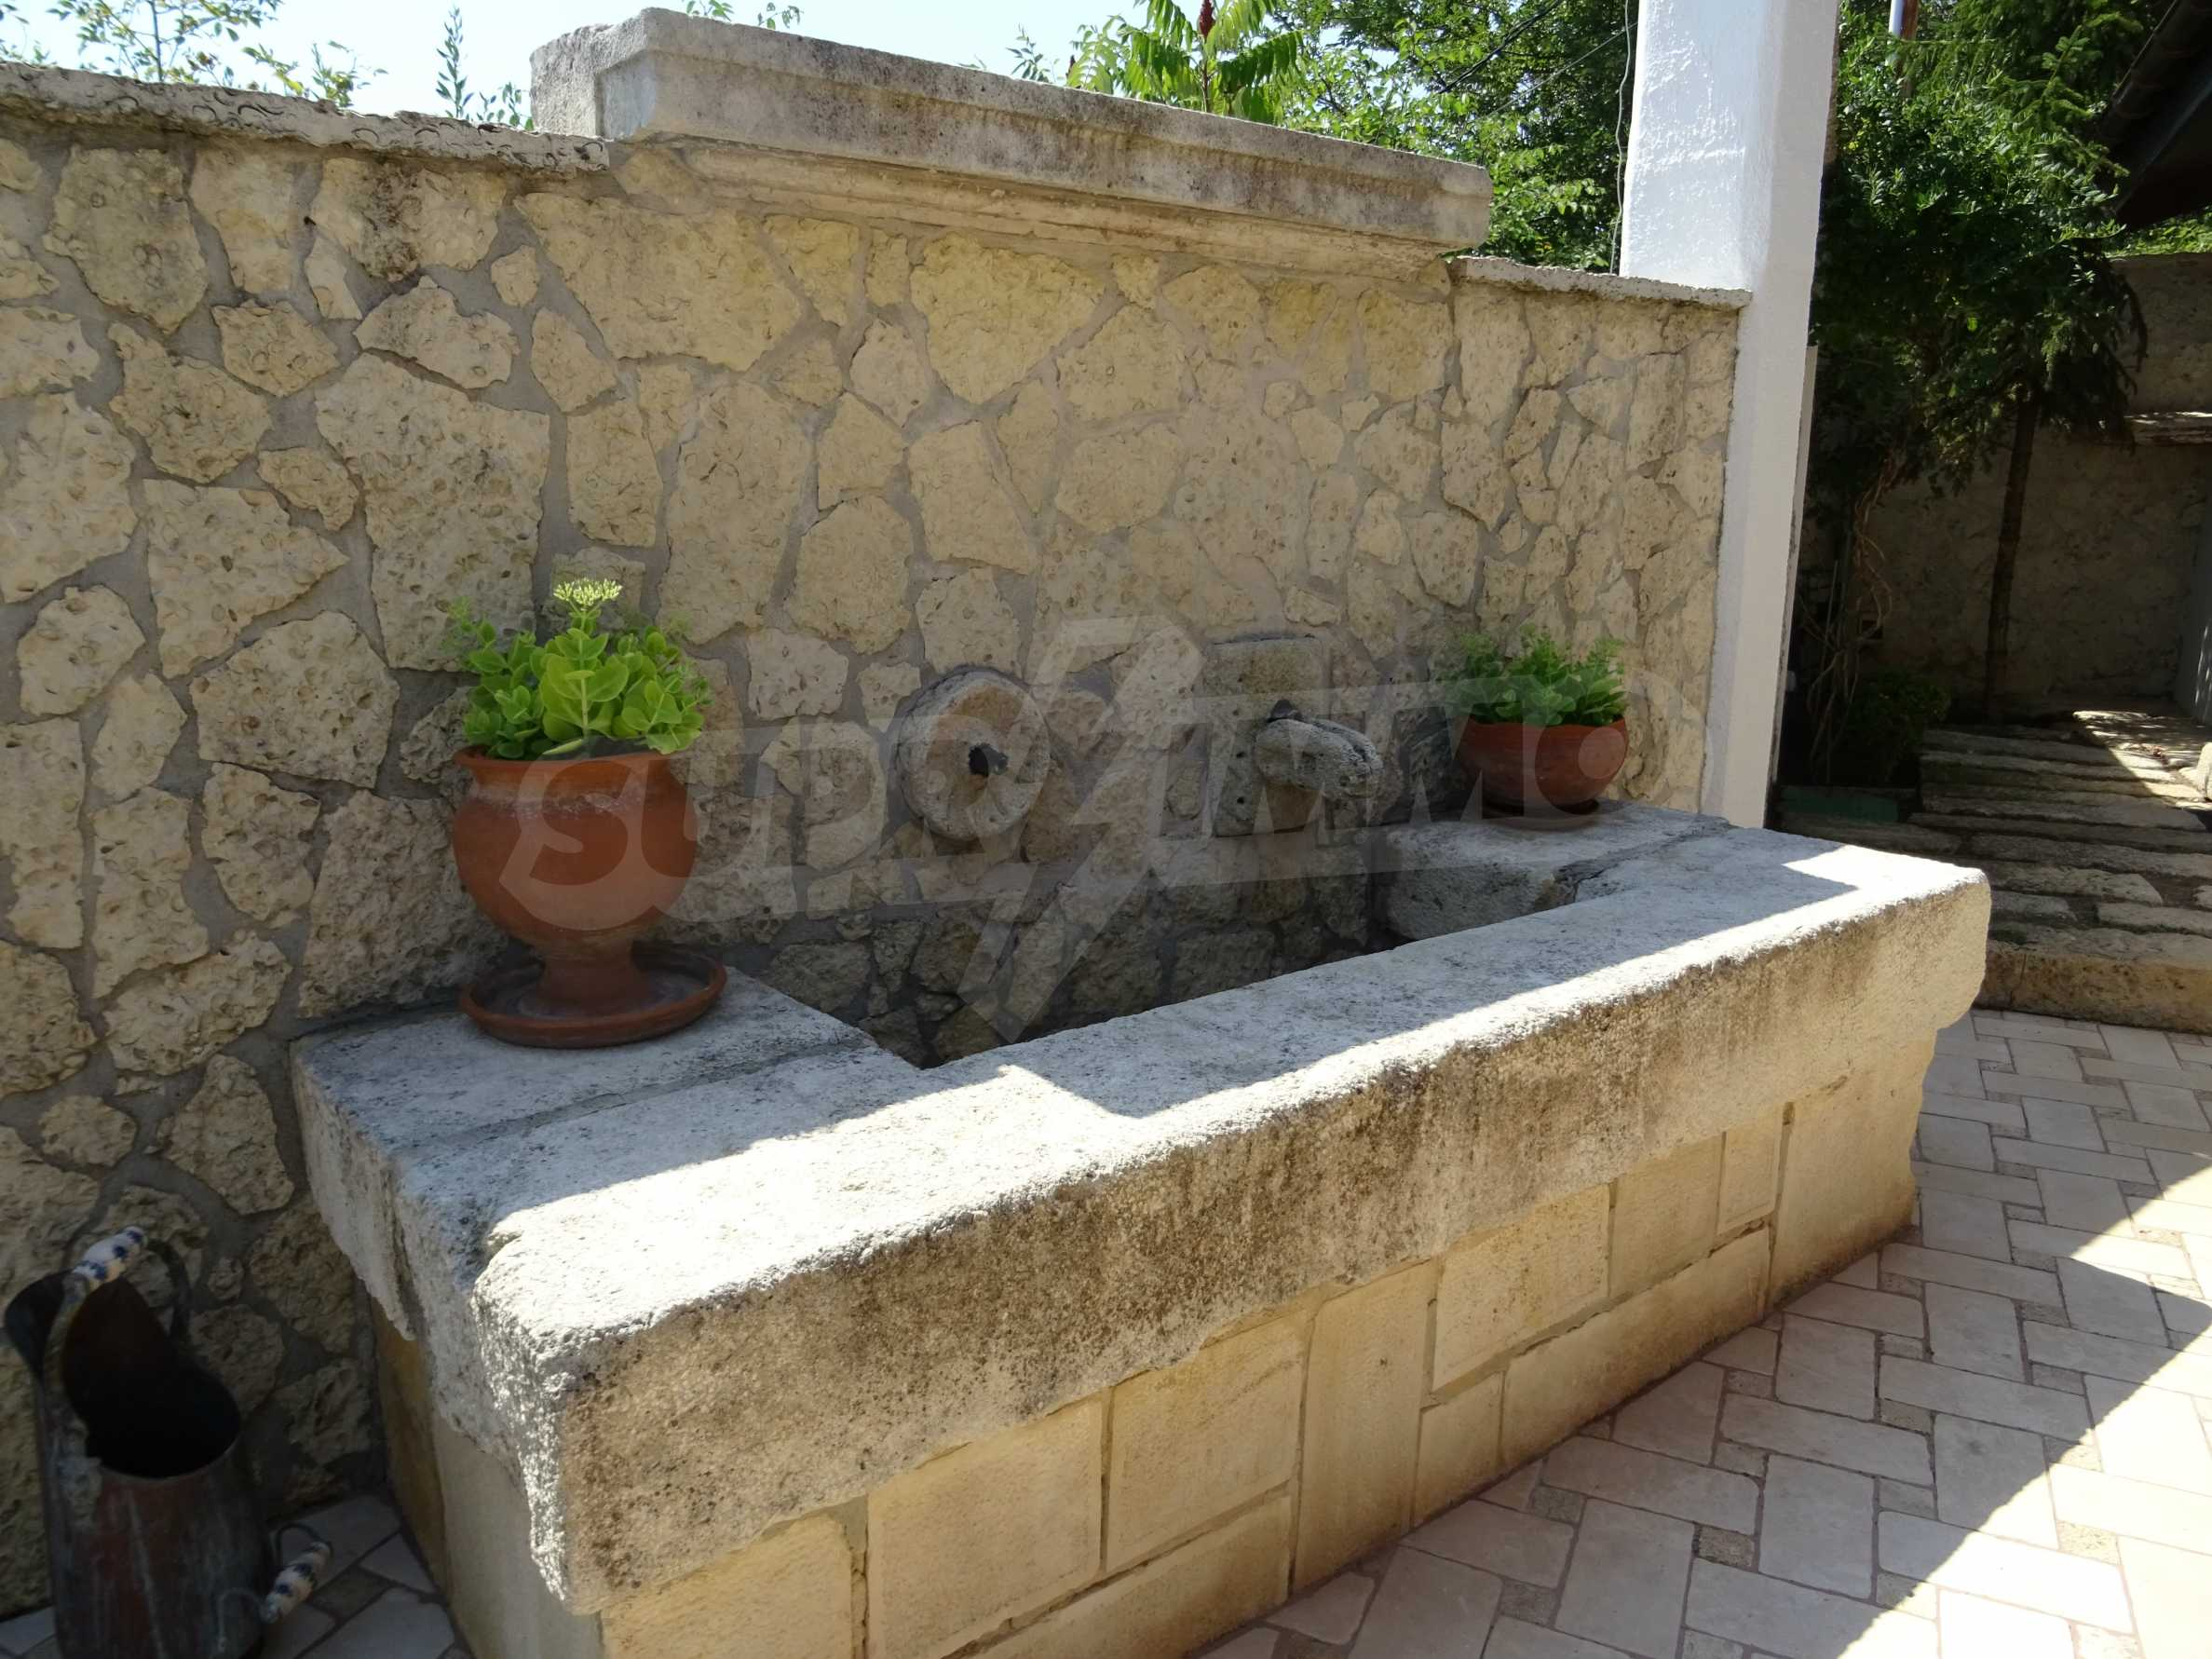 The Mediterranean style - a sense of luxury 8